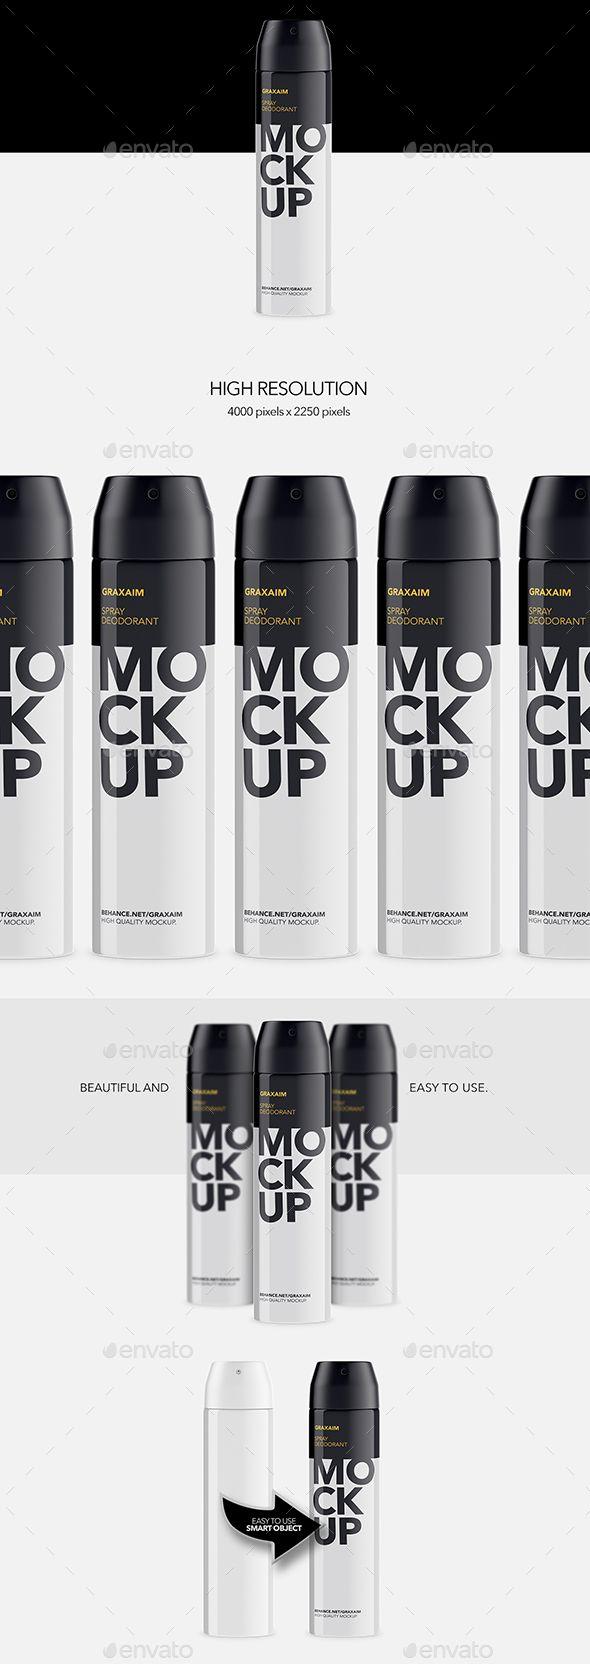 Metallic Spray Bottle Deodorant - Mockup by Graxaim Metallic Spray Bottle Deodorant �20Mockup Featured 1 mockup